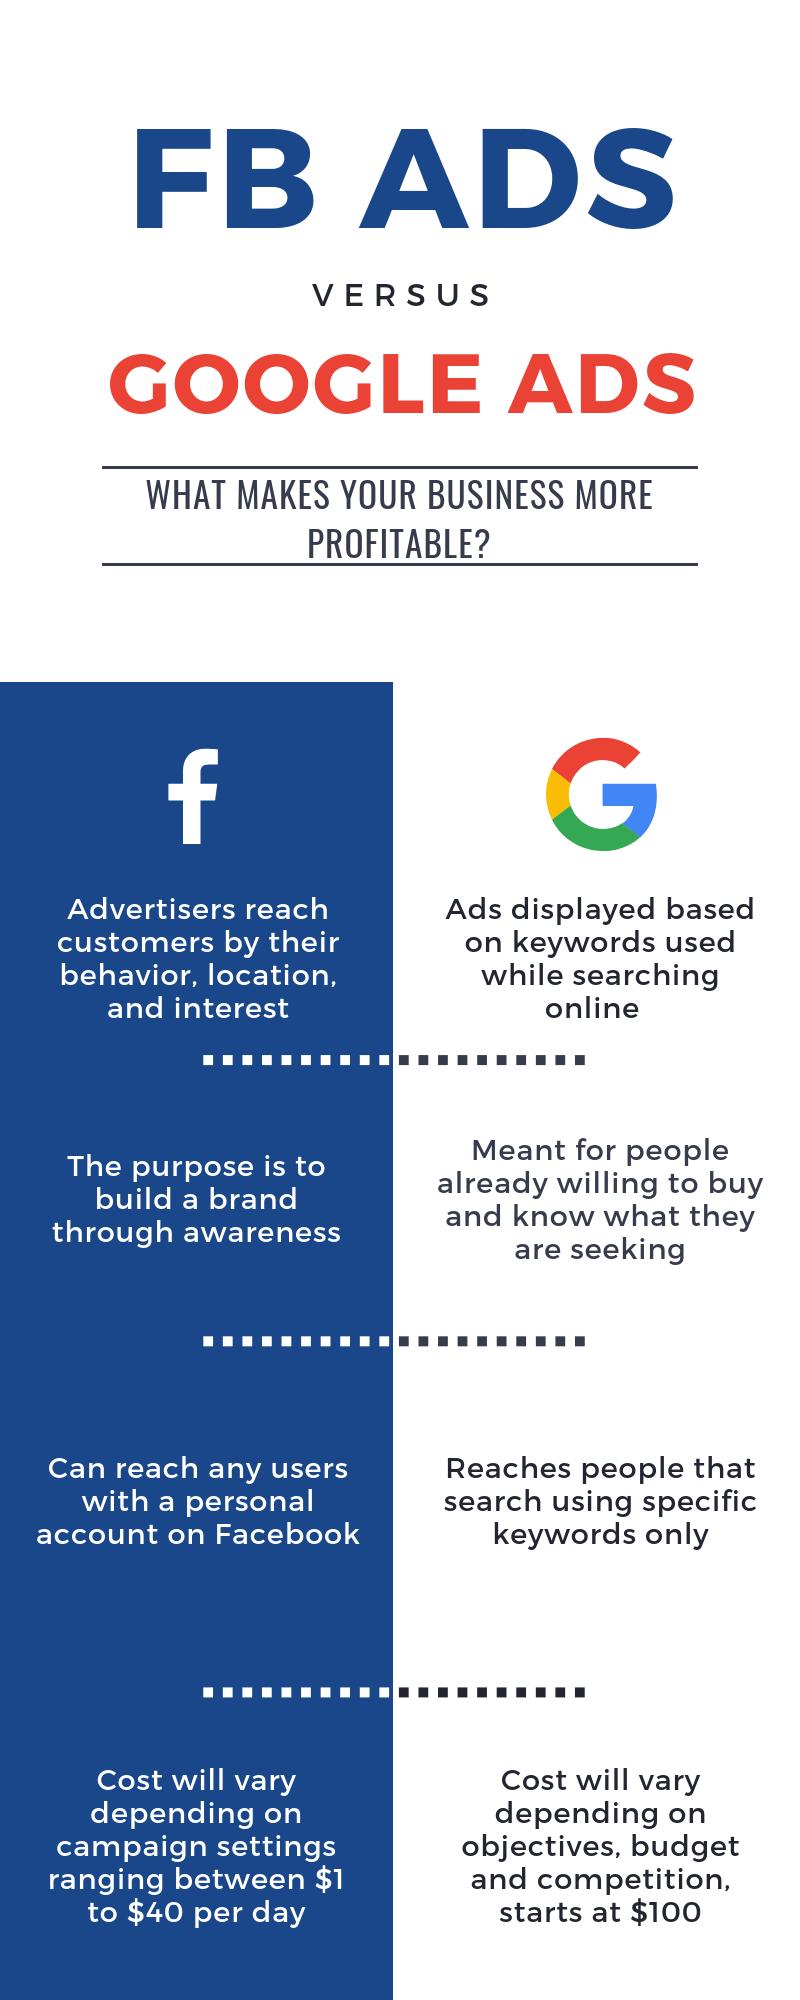 fb-vs-google-ads-mca-leads-pro